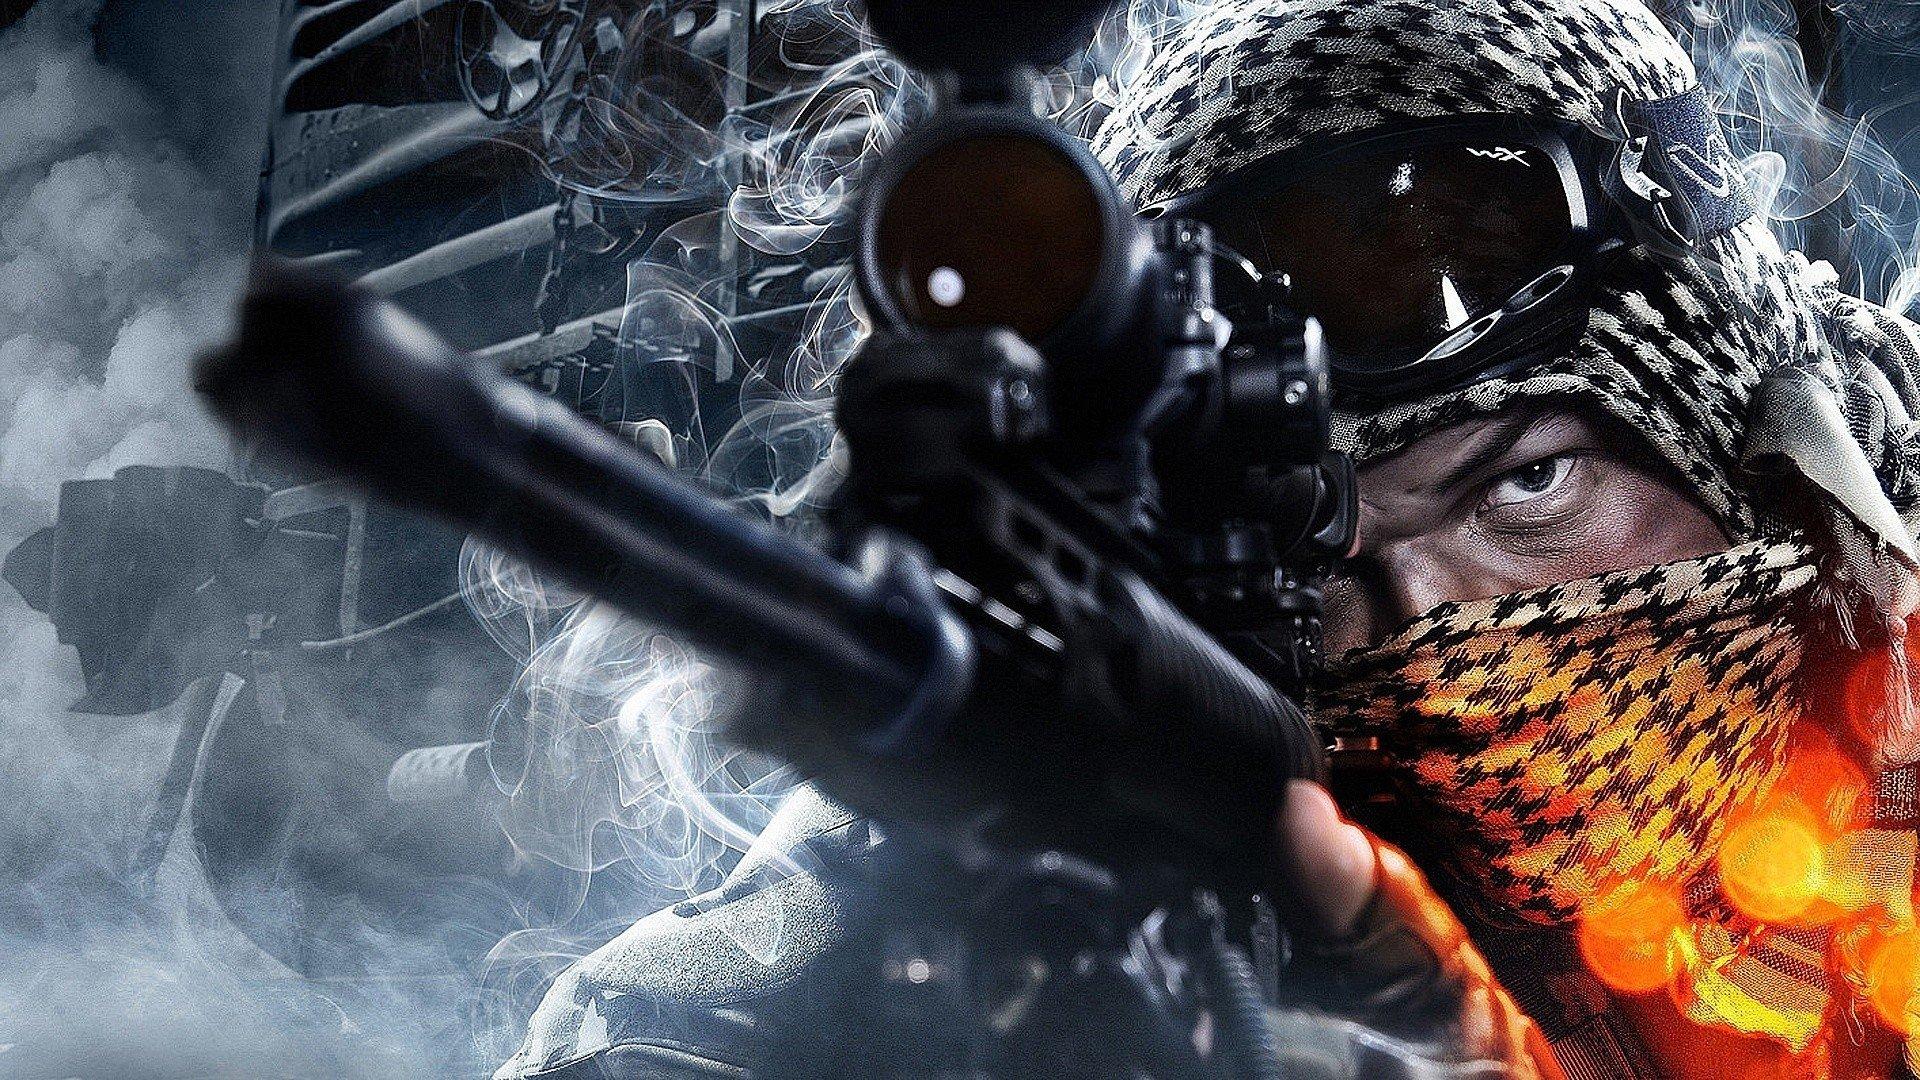 Close-up Battlefield 3 Sniper Guy Game Mk11 Mod0 Wallpaper